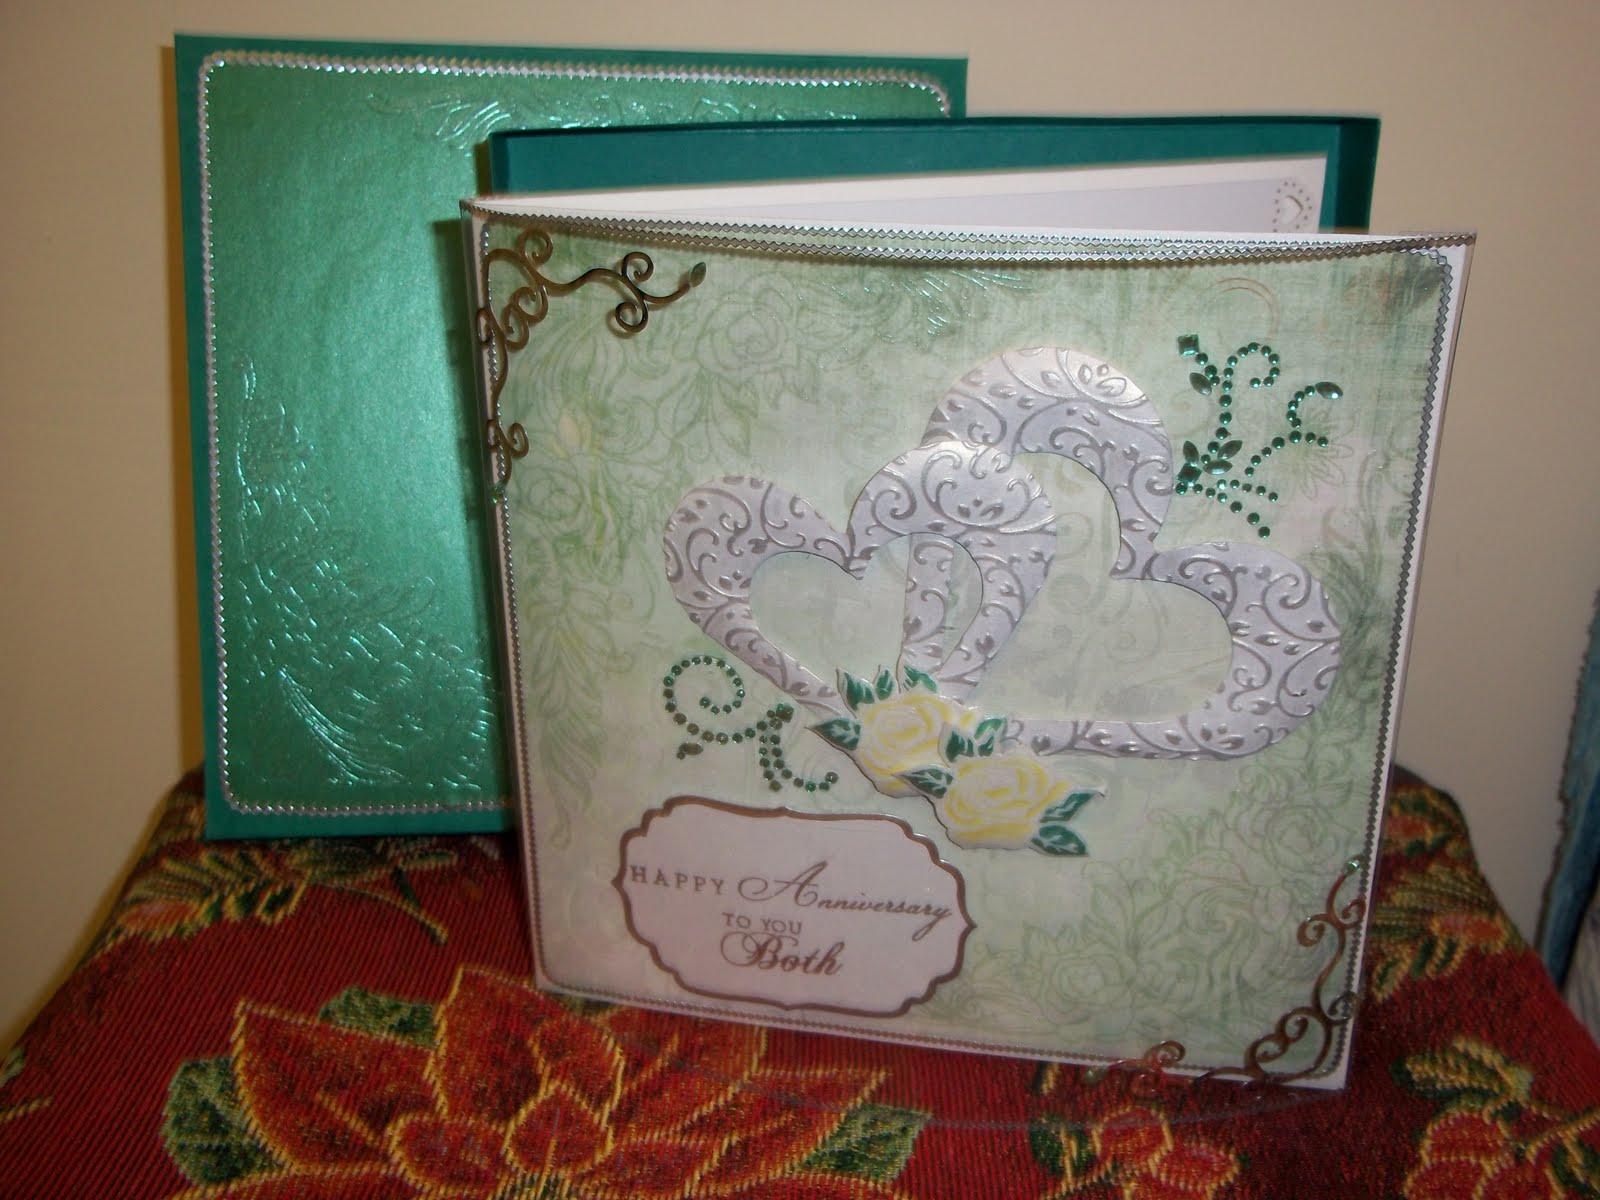 Emerald Wedding Anniversary Gifts: Emmas Cards UK